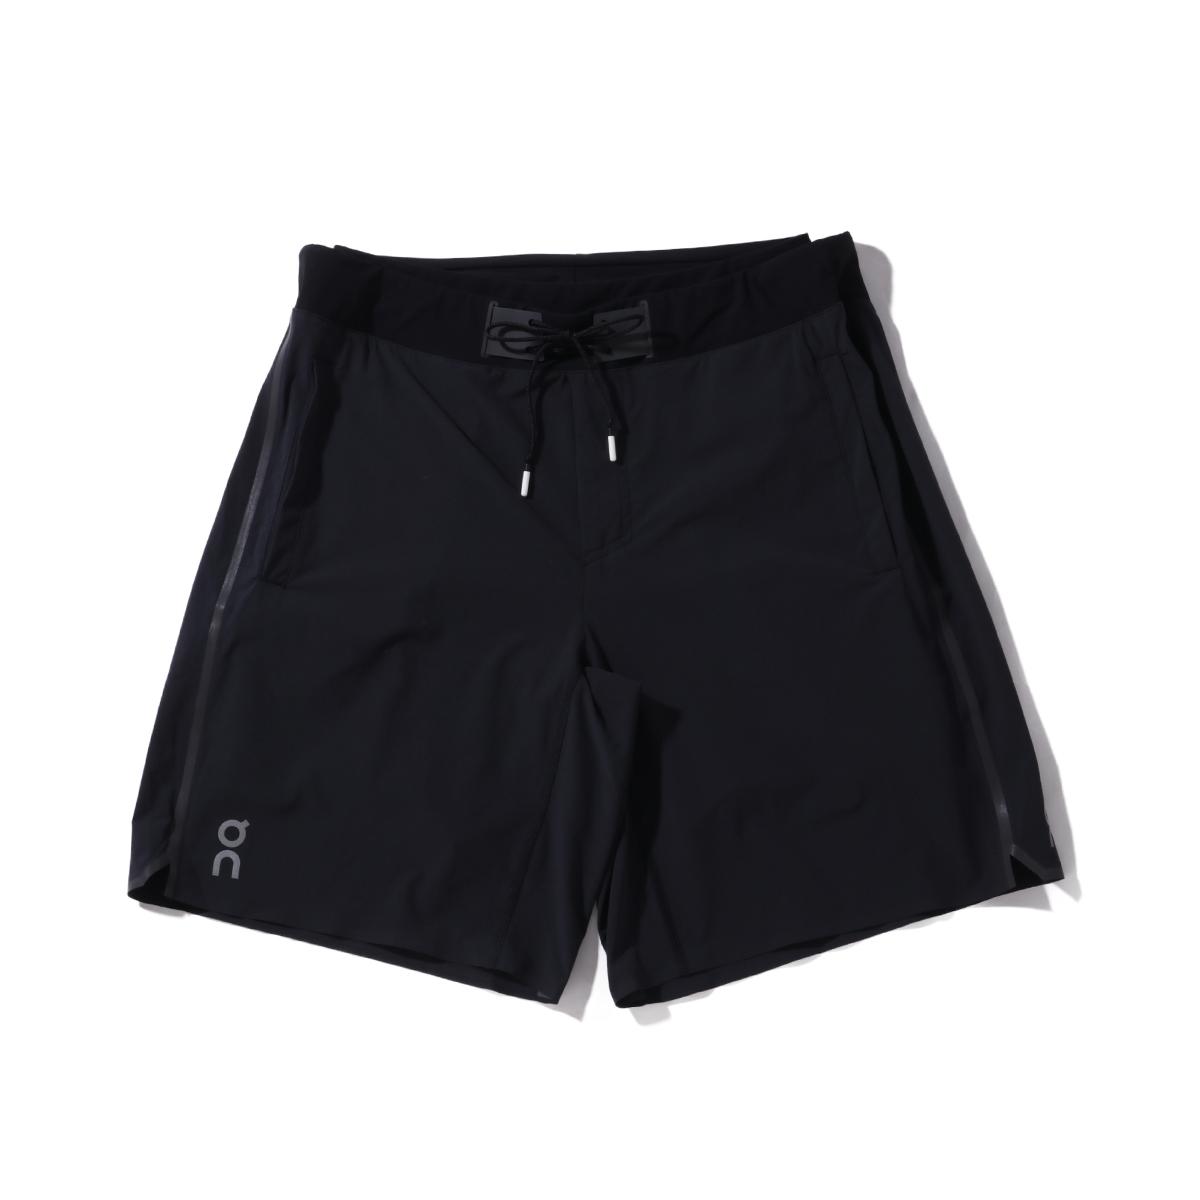 On Hybrid Shorts(Black)(オン ハイブリッド ショーツ)【メンズ】【ハーフパンツ】【19FW-I】